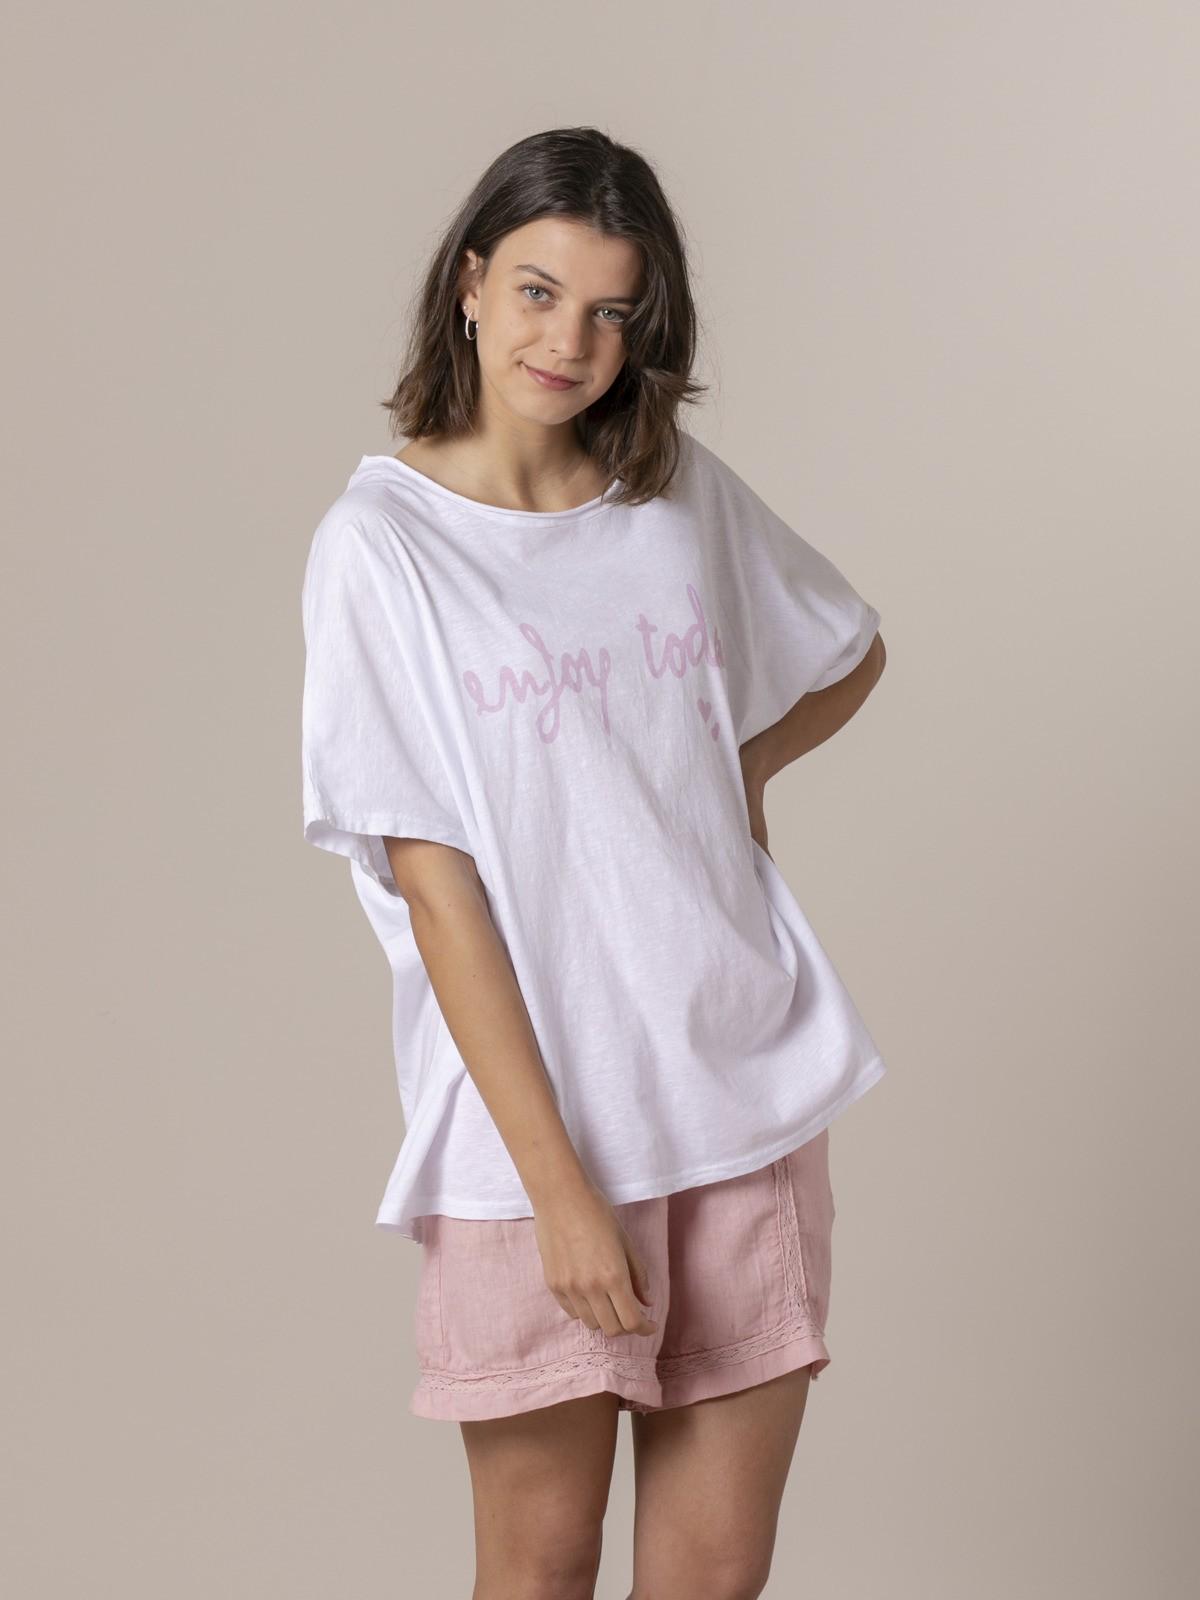 Woman Woman Enjoy today t-shirt Pink